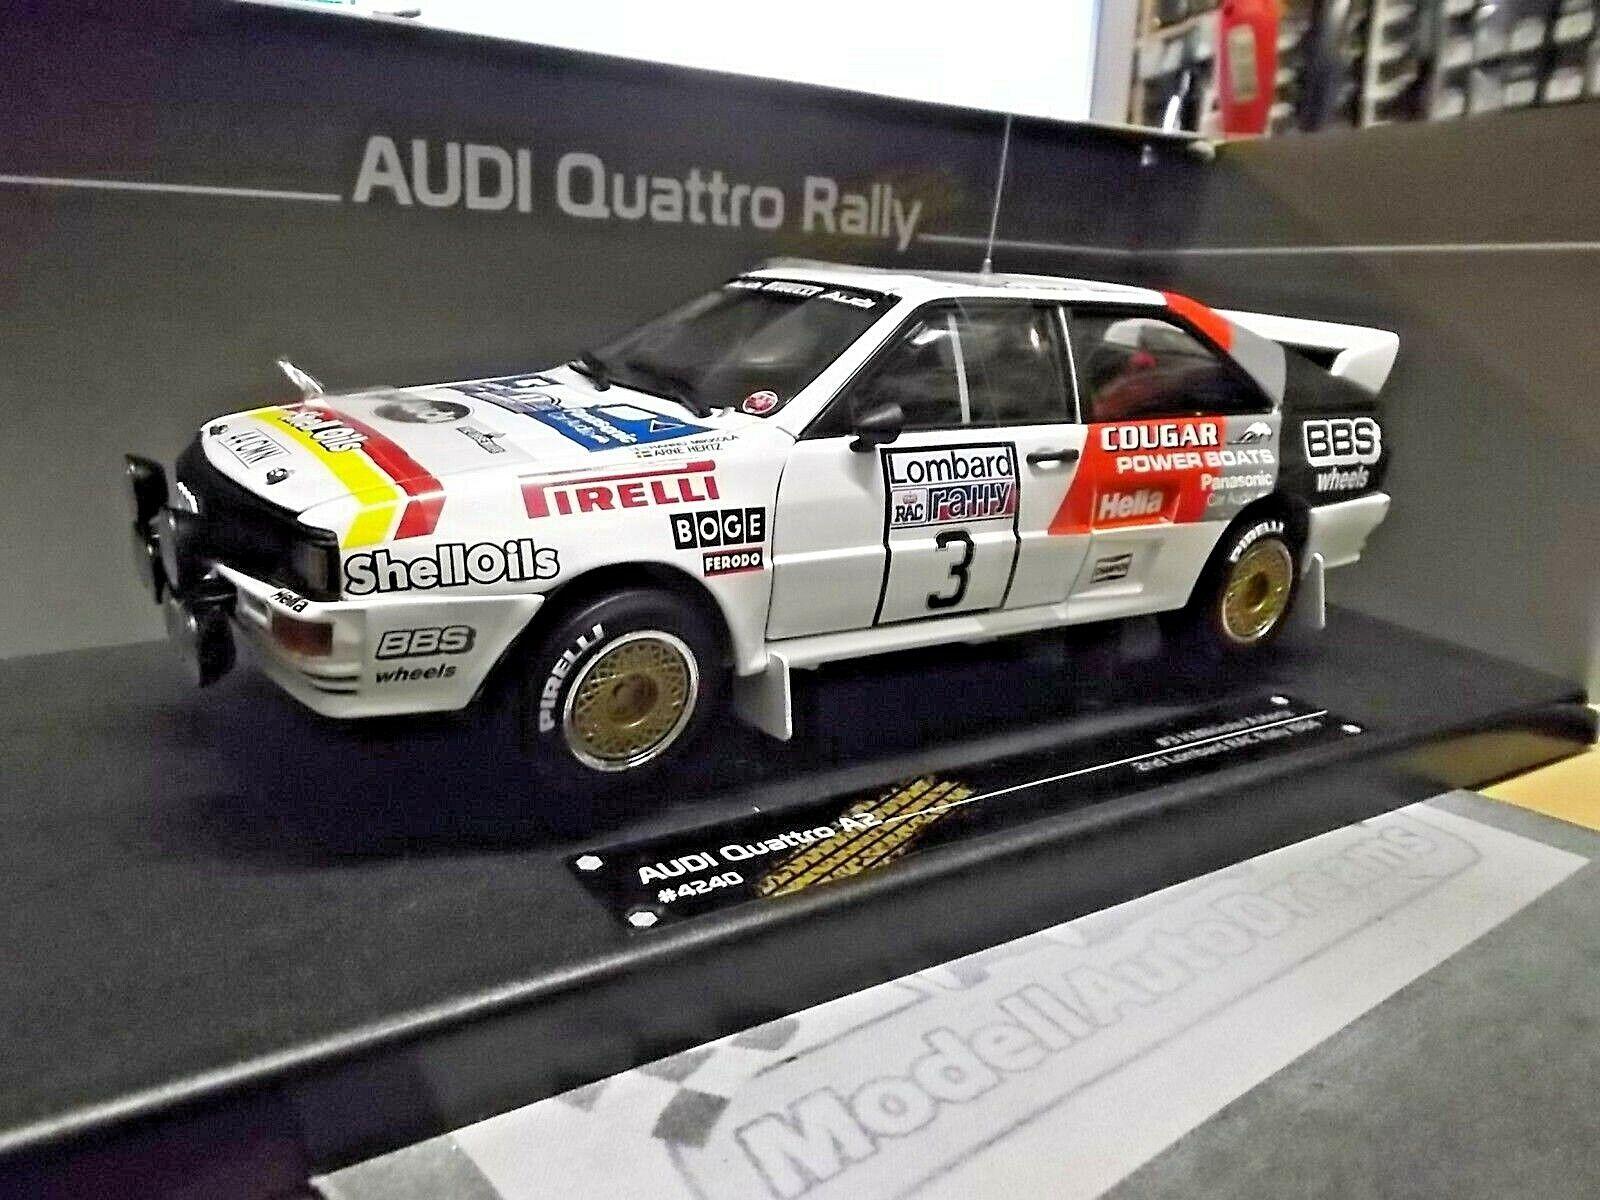 AUDI QUATTRO RALLYE GB RAC 1984 Sutton Mikkola  3 BBS pireli SUNSTAR SST 1 18